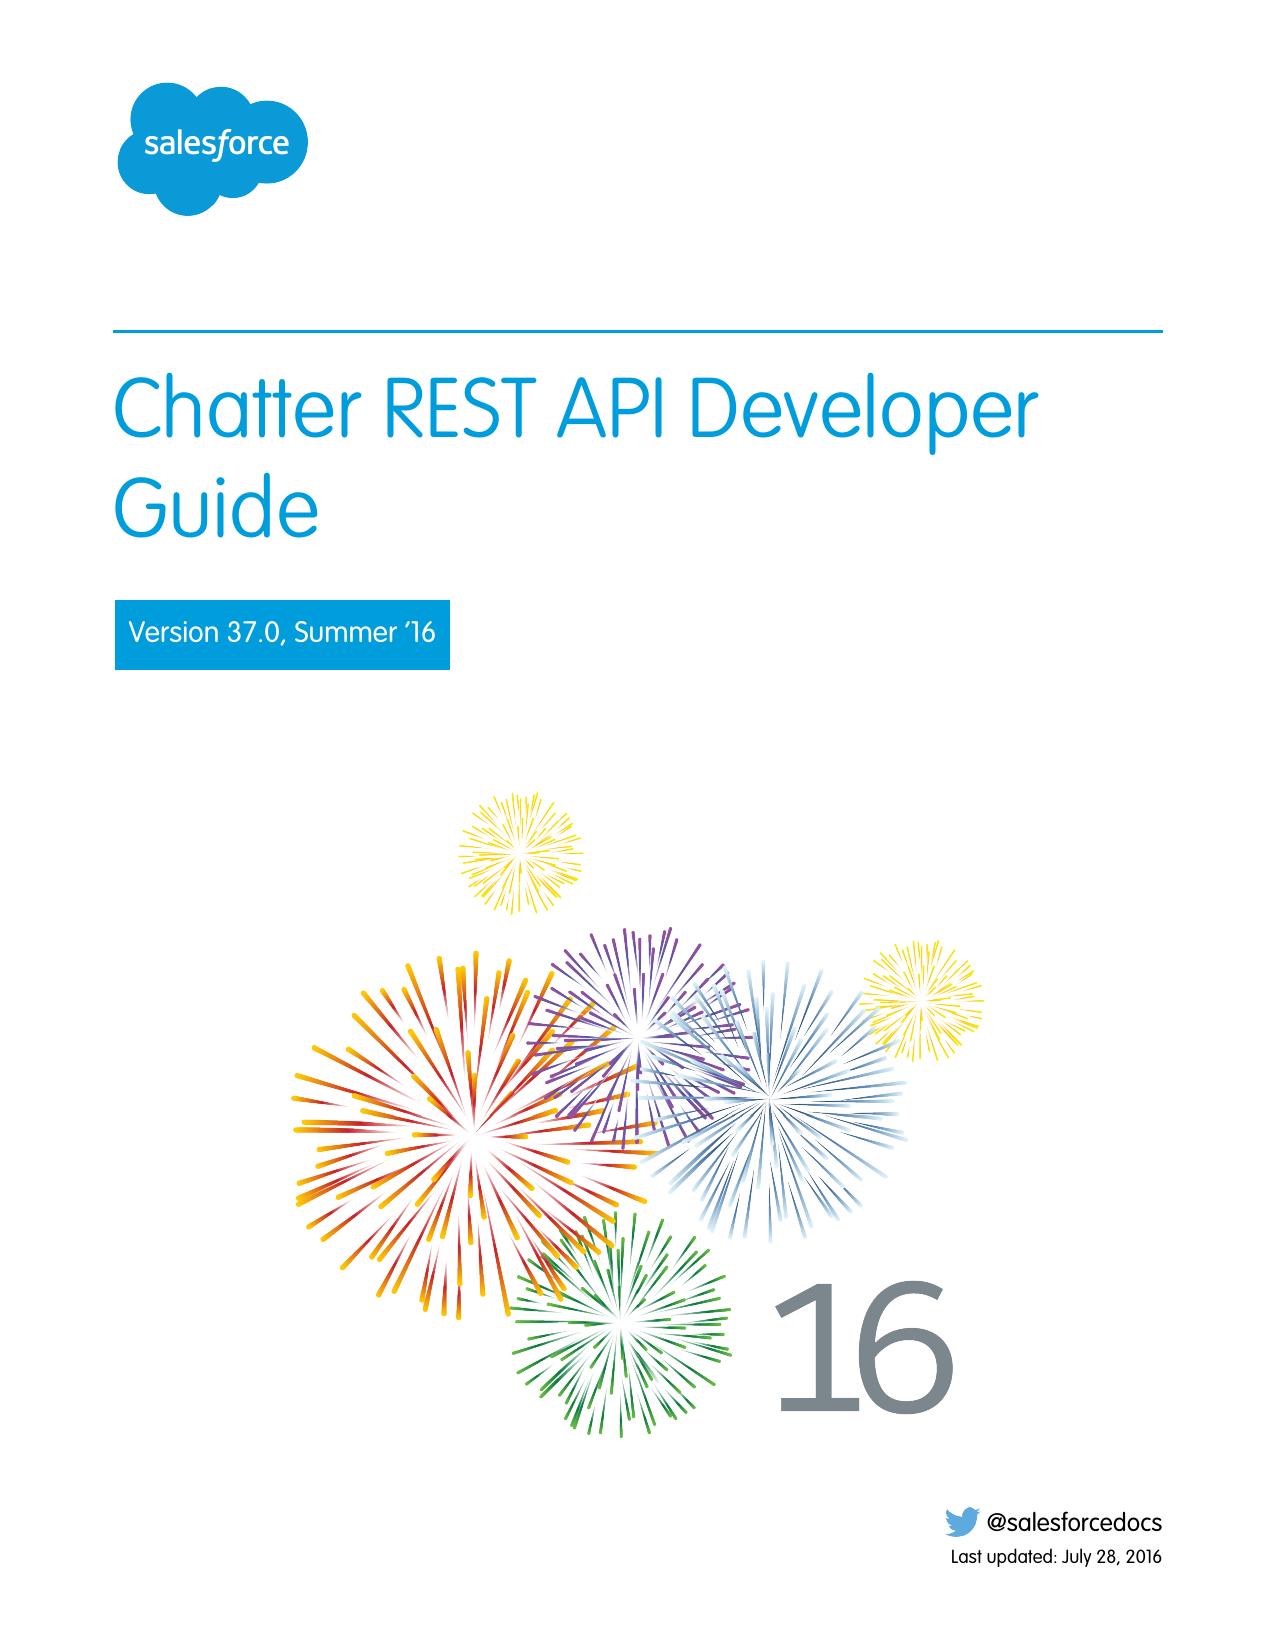 Chatter REST API Developer Guide | manualzz com